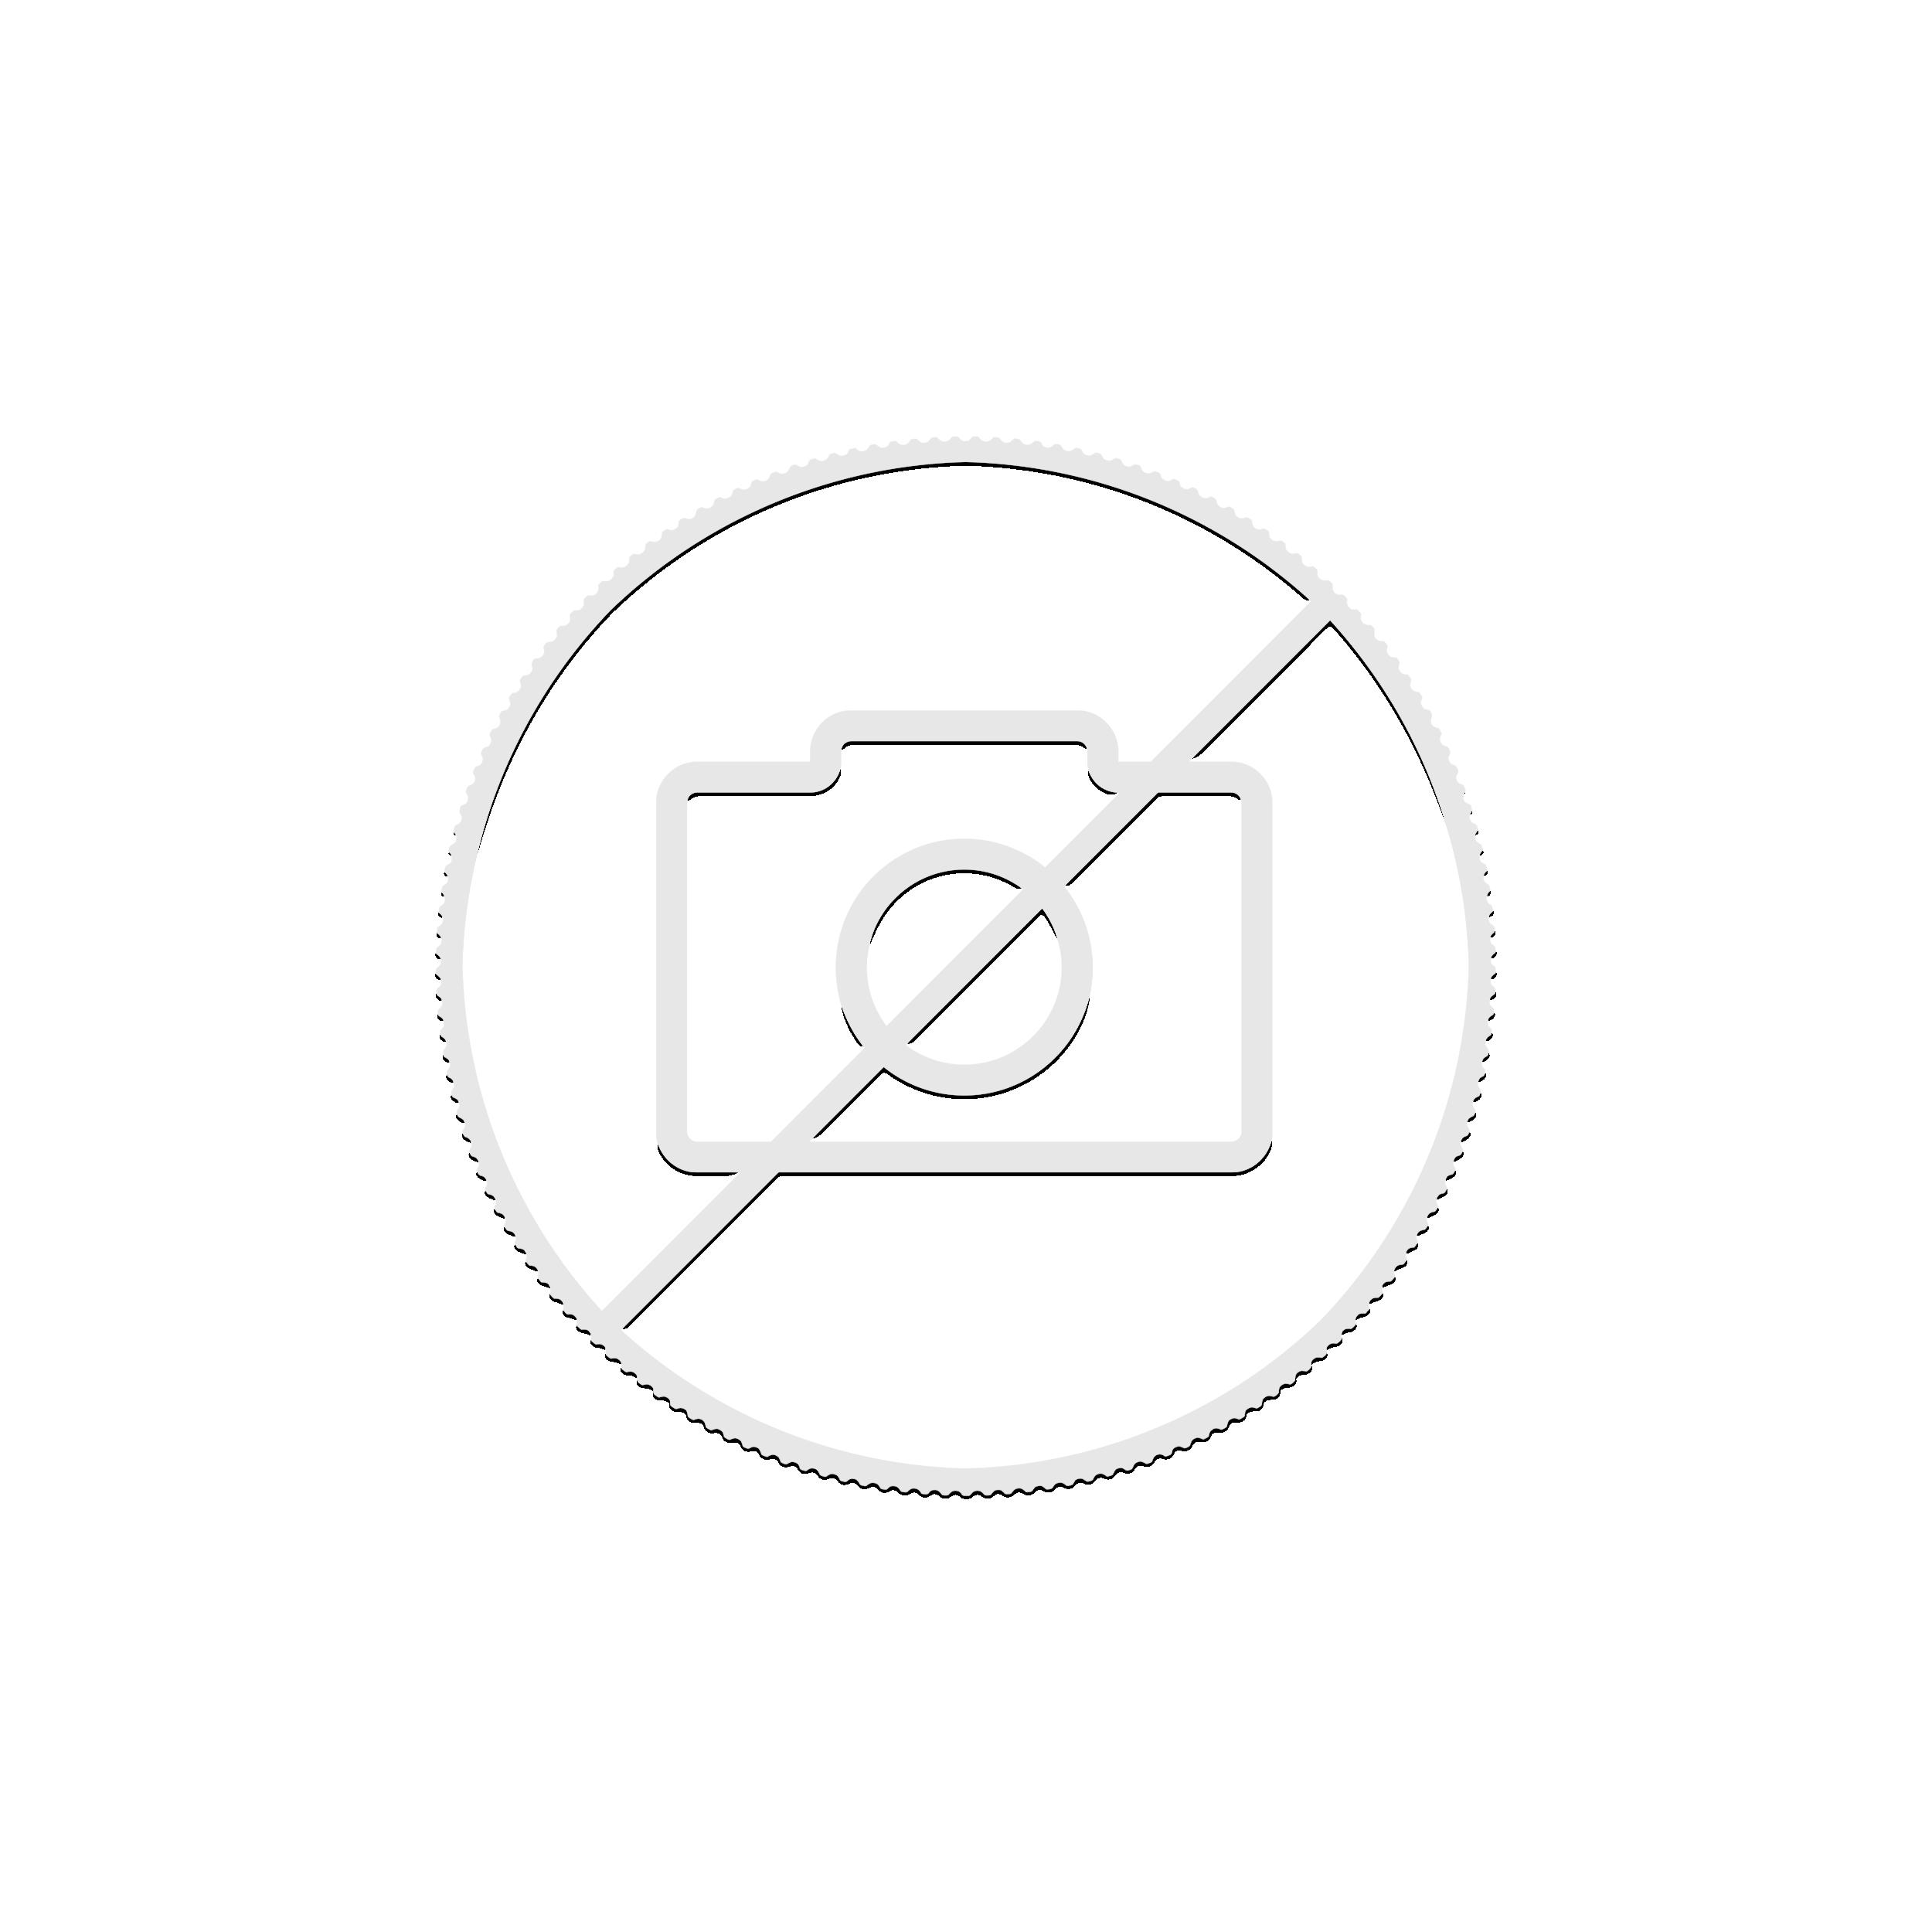 1 Troy ounce gold coin bar Rectangular Dragon 2021